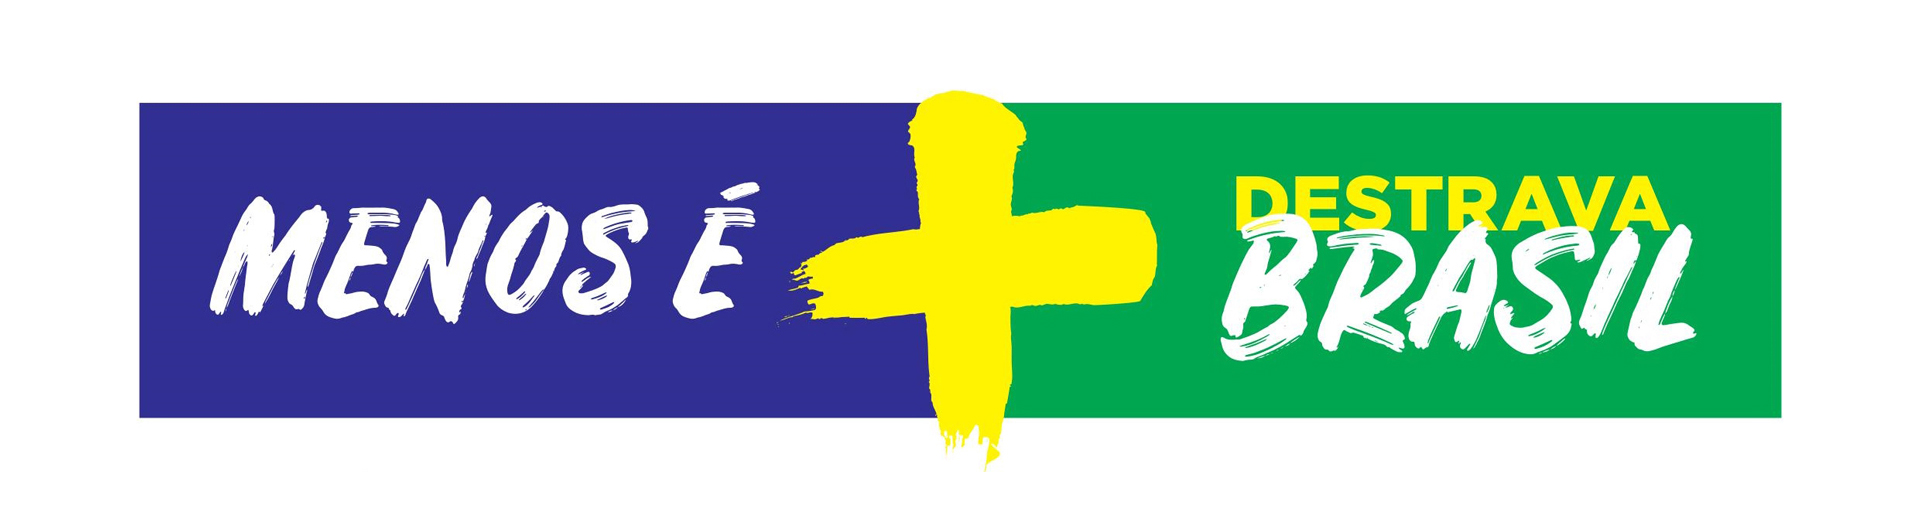 Destrava Brasil